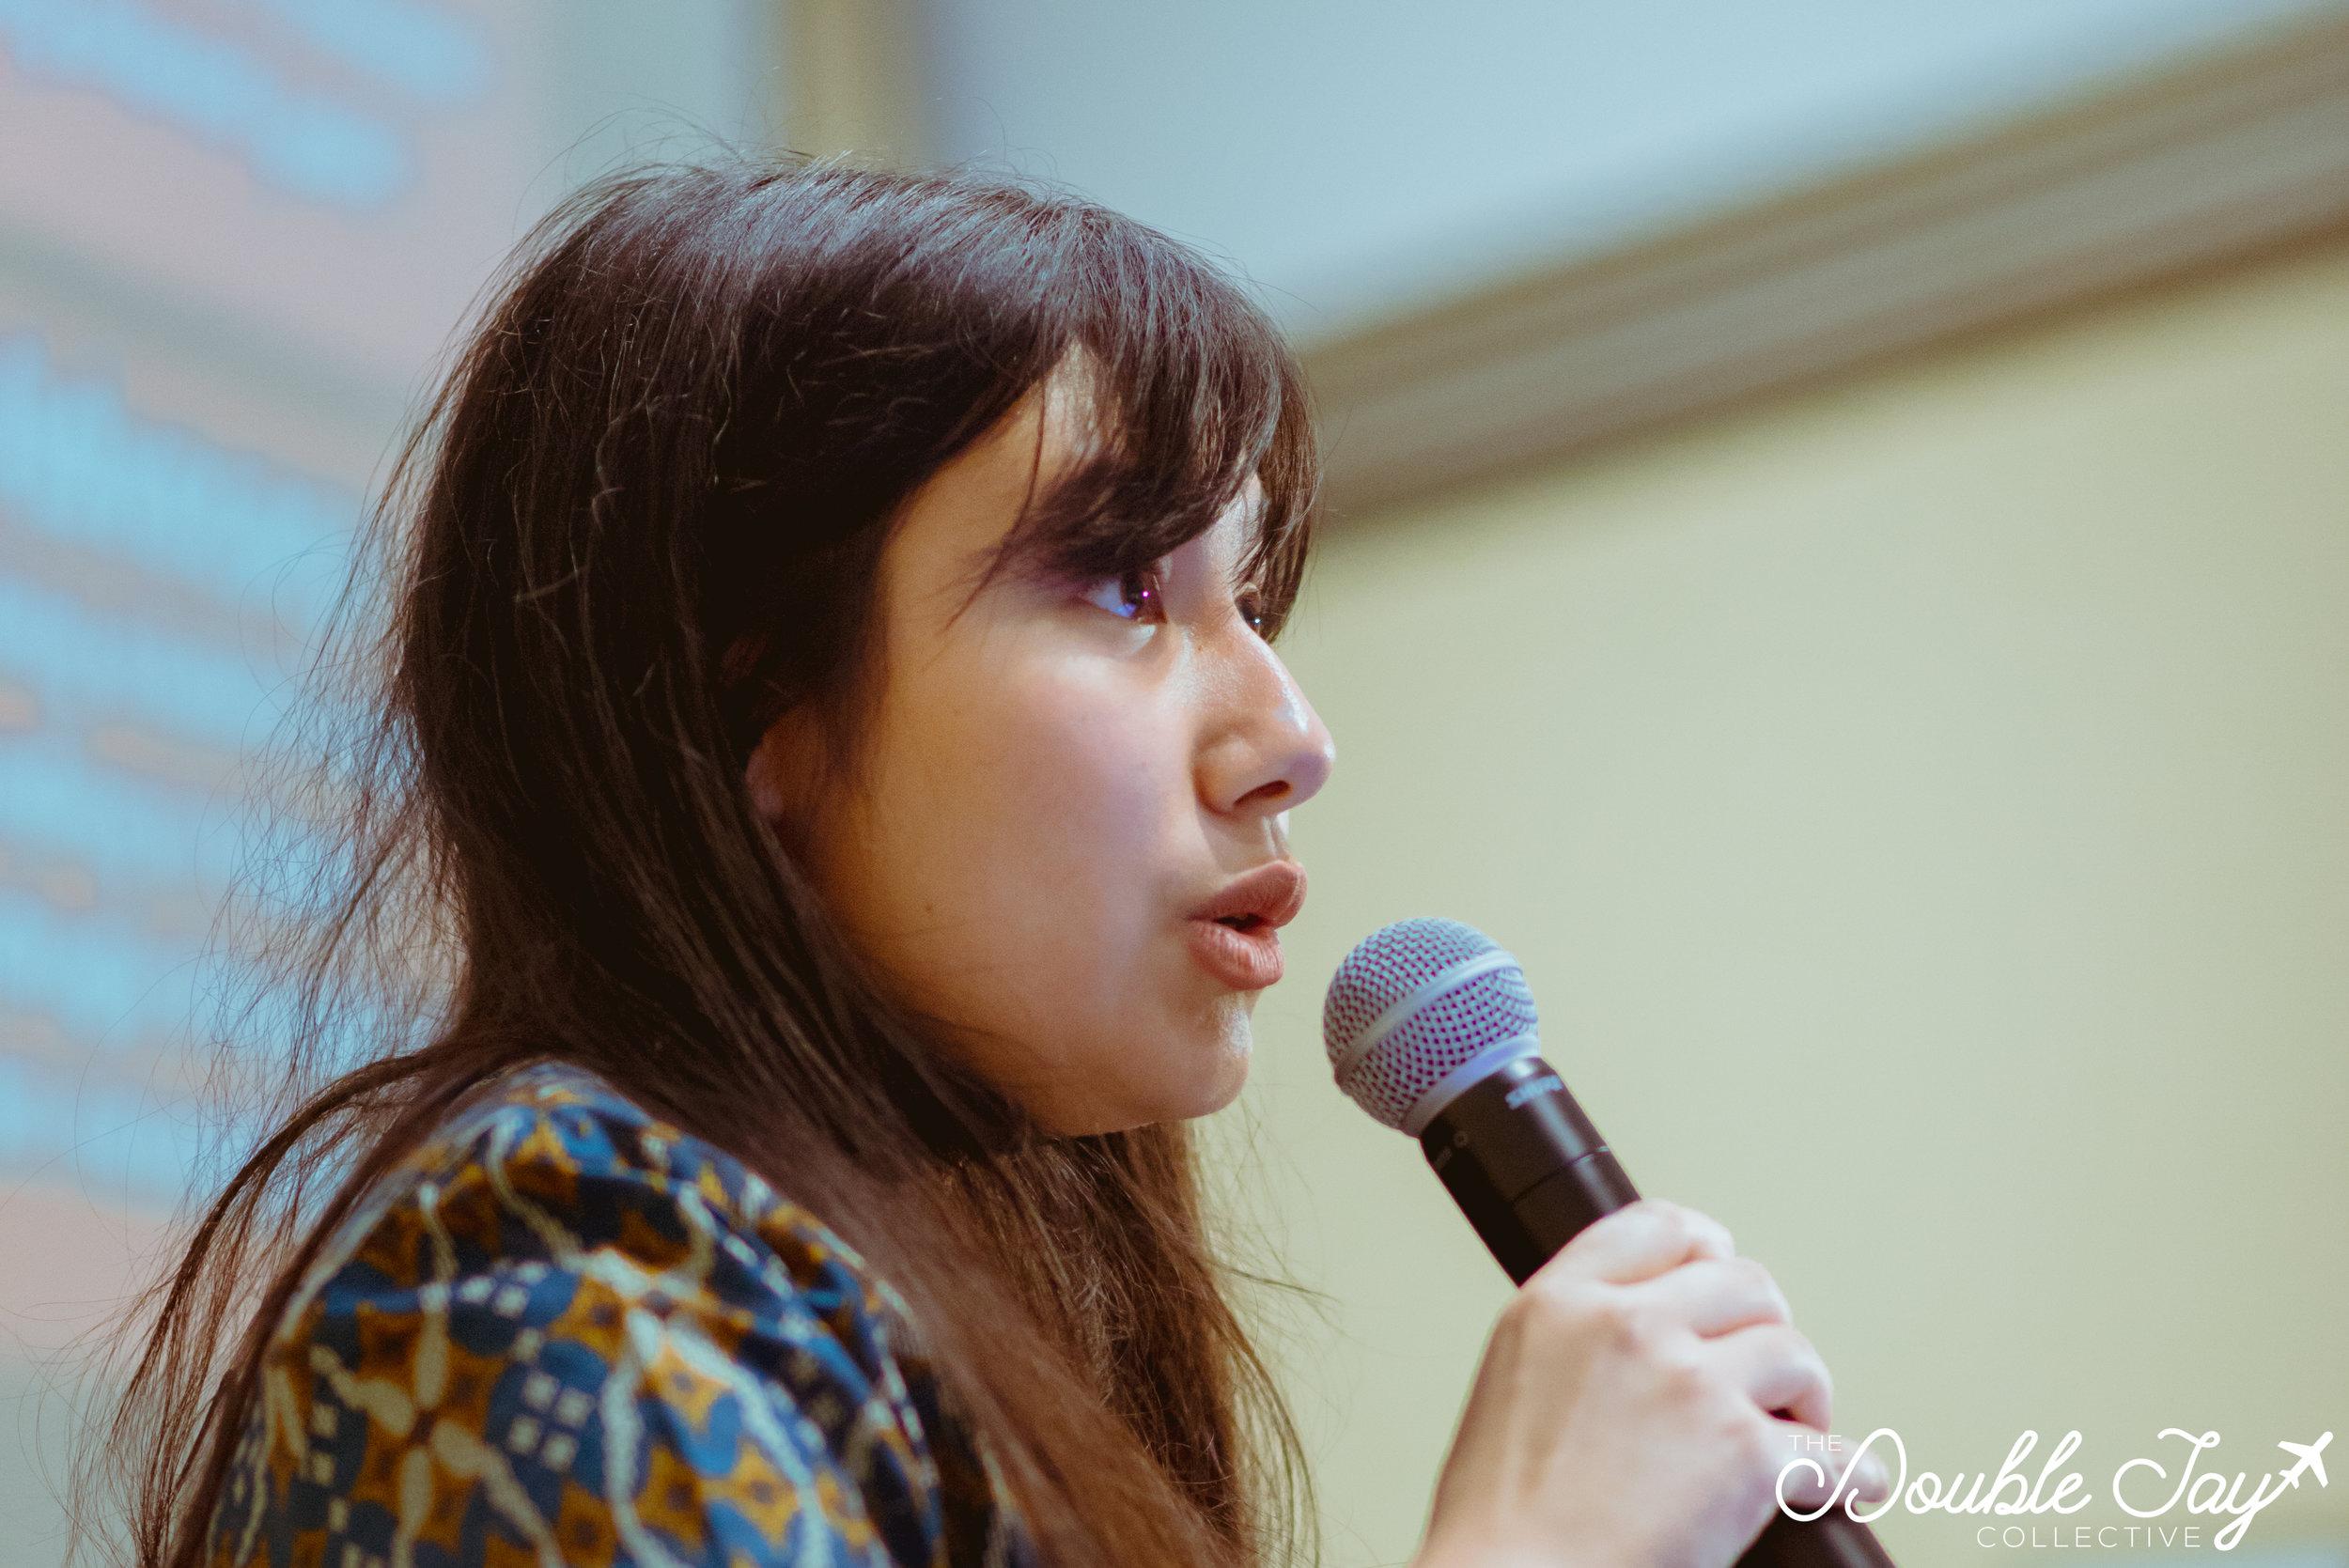 Sarah Ghassan, Western University graduate, and member of the OESC.